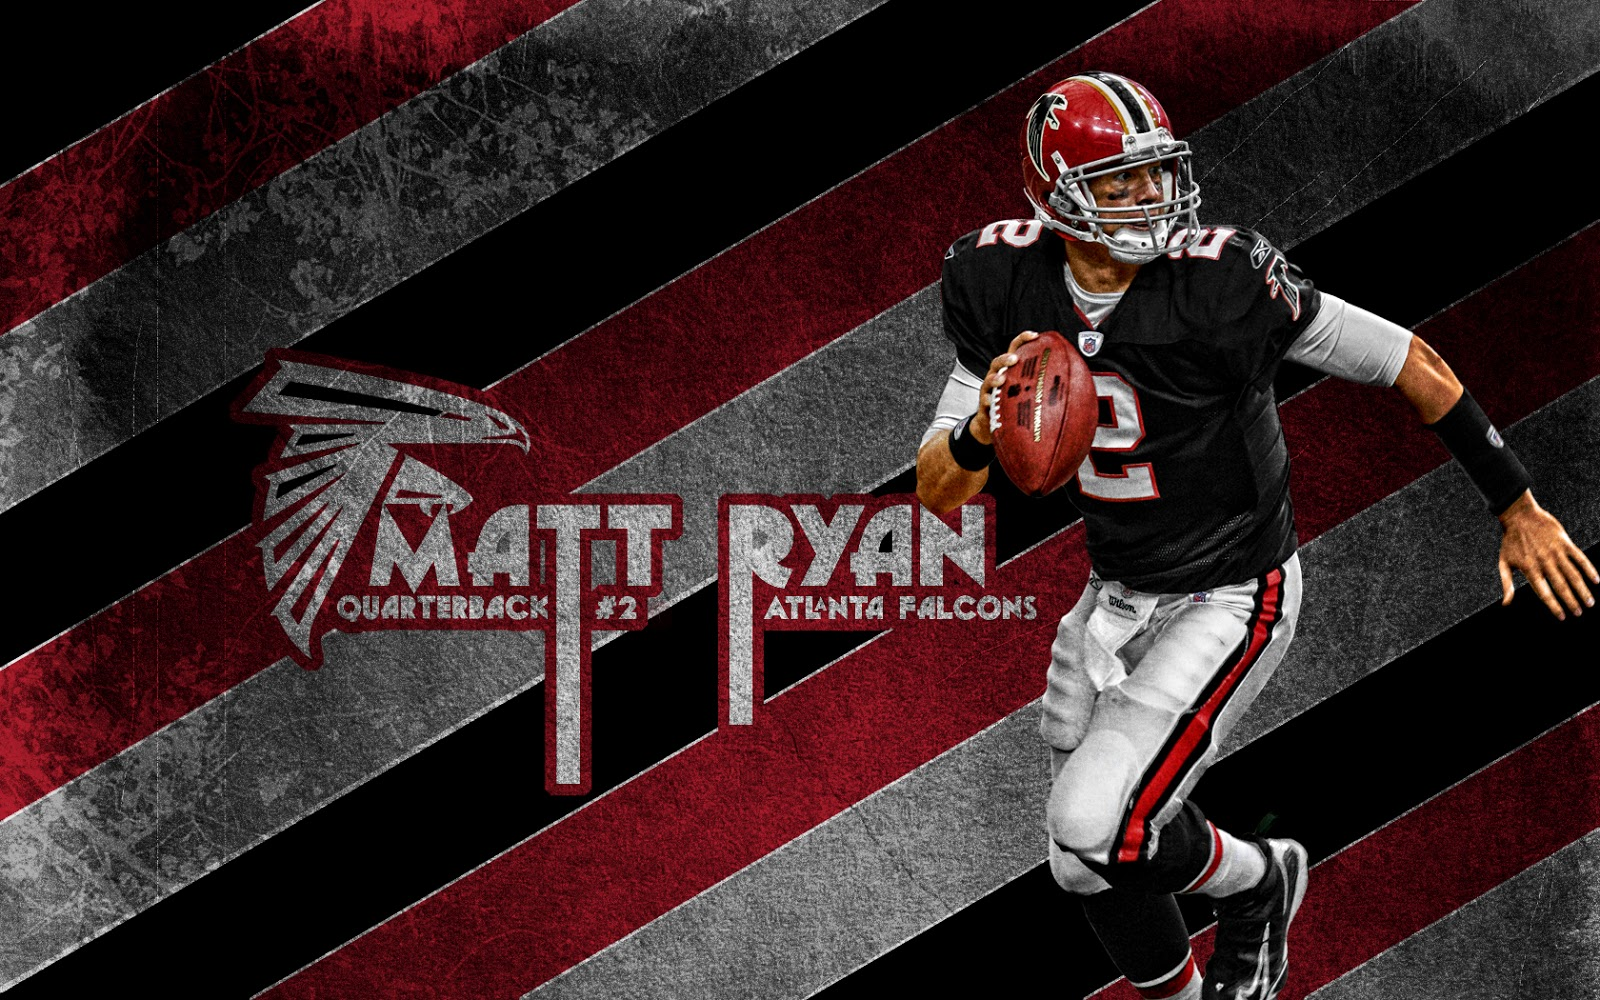 Atlanta Falcons Backgrounds Hq: FOOTBALLPLAYERSDELUXE: MATT RYAN